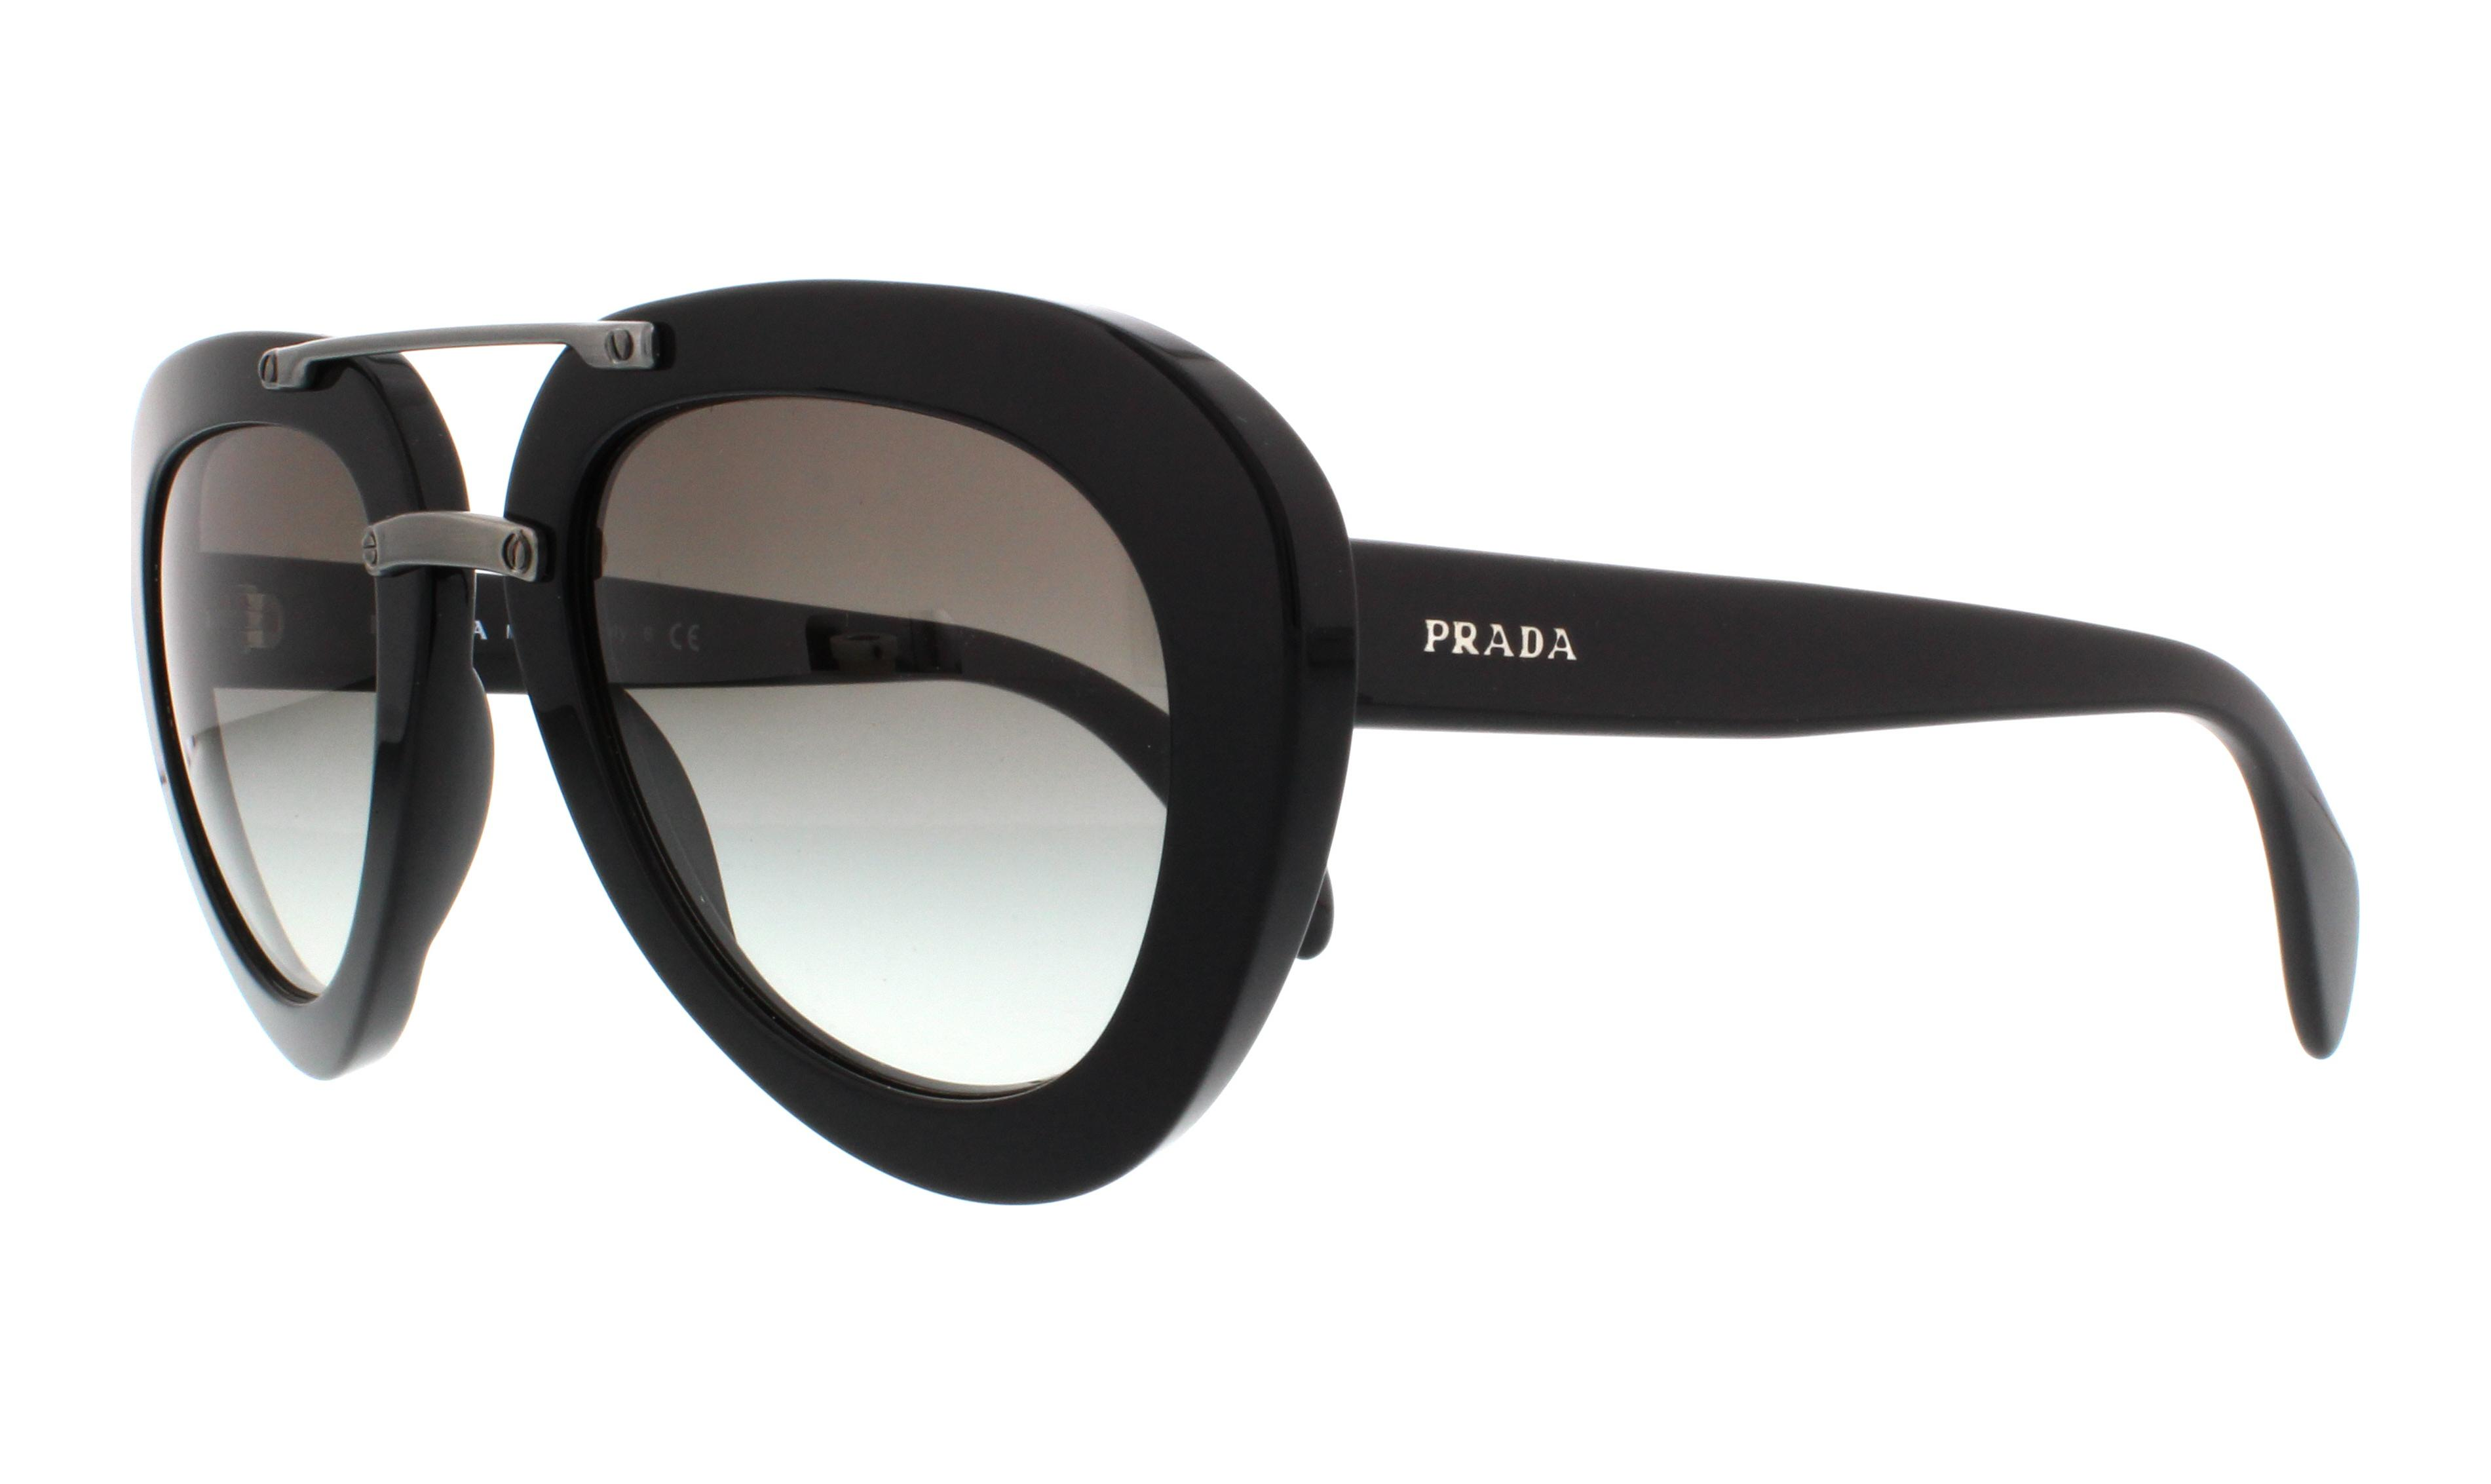 89b1f3dfa89 new zealand lyst prada d frame optical glasses in black b1d63 84339  czech  picture of prada sunglasses pr28rs 60ae0 9b348